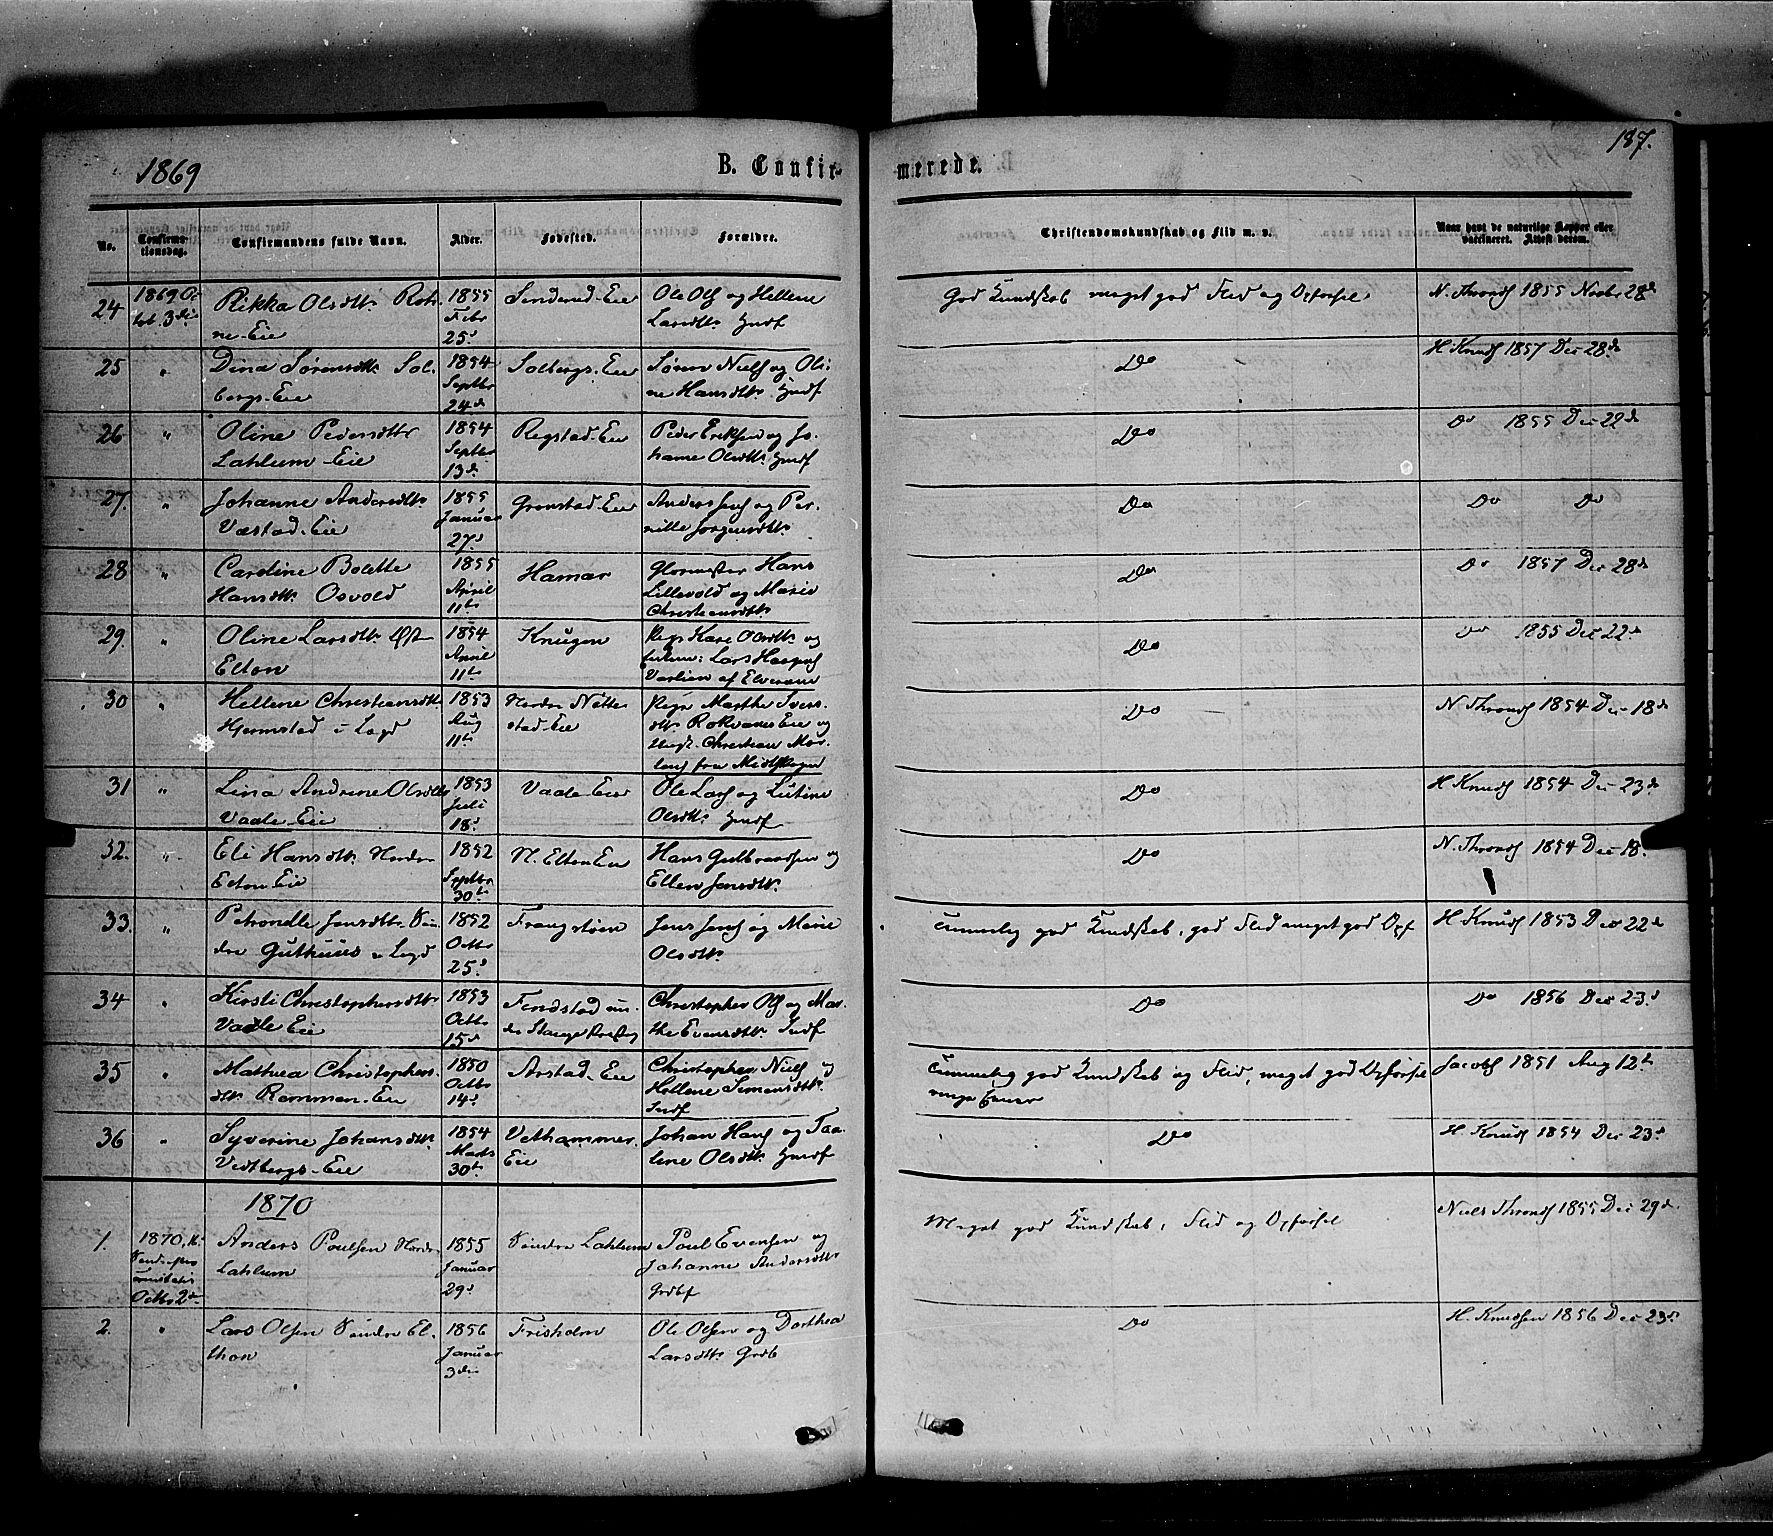 SAH, Stange prestekontor, K/L0013: Ministerialbok nr. 13, 1862-1879, s. 187